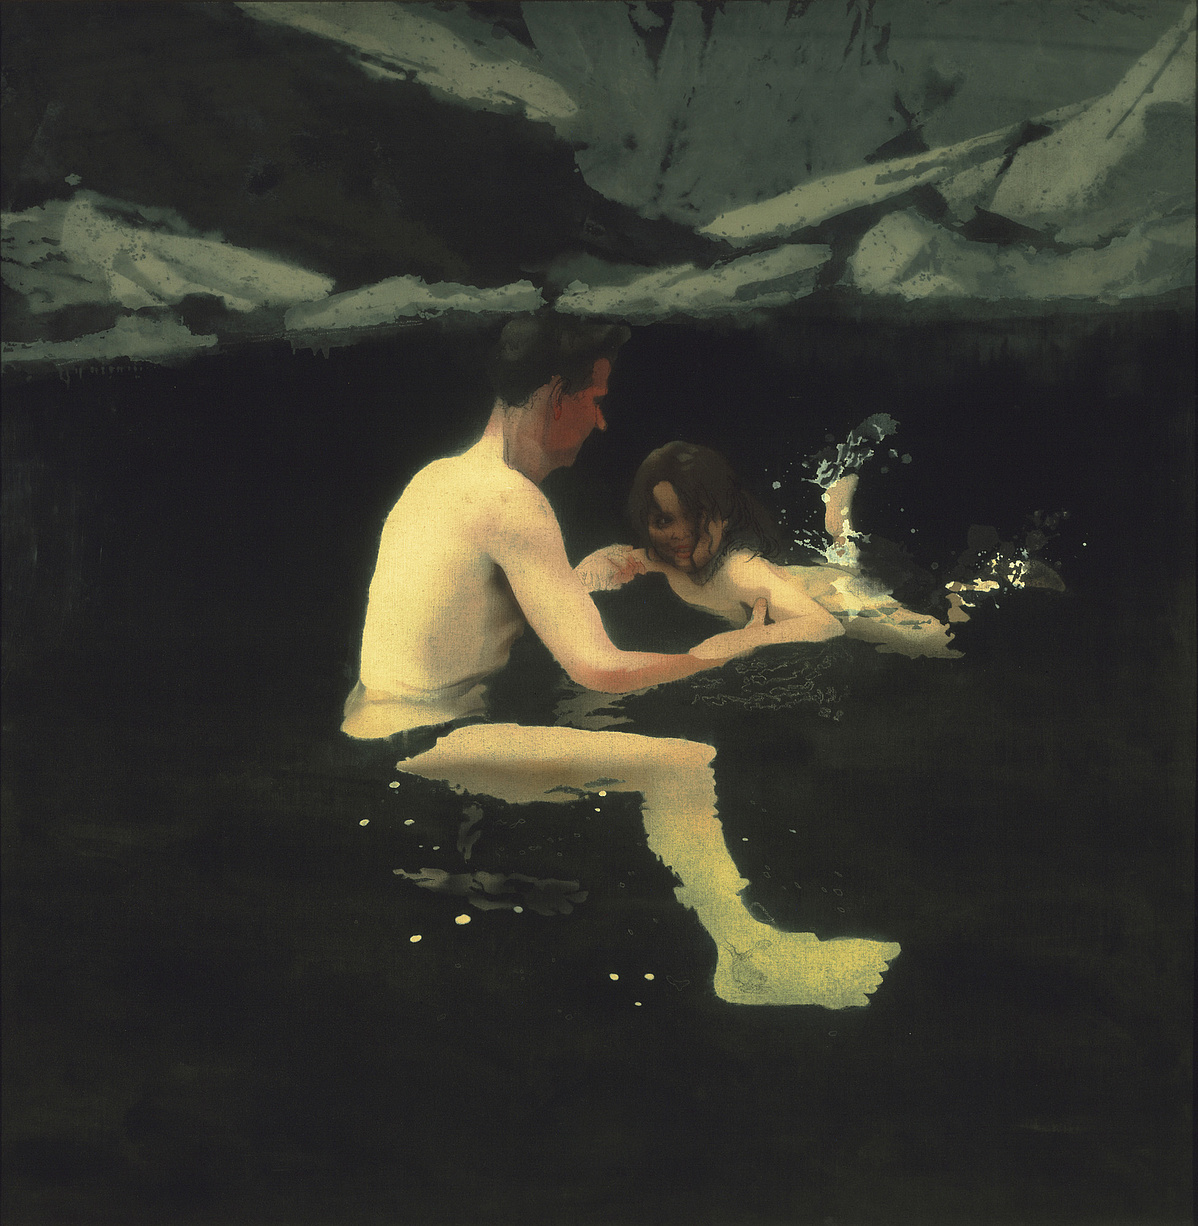 MichaelAndrews-MelanieandMeSwimming-133240.jpg